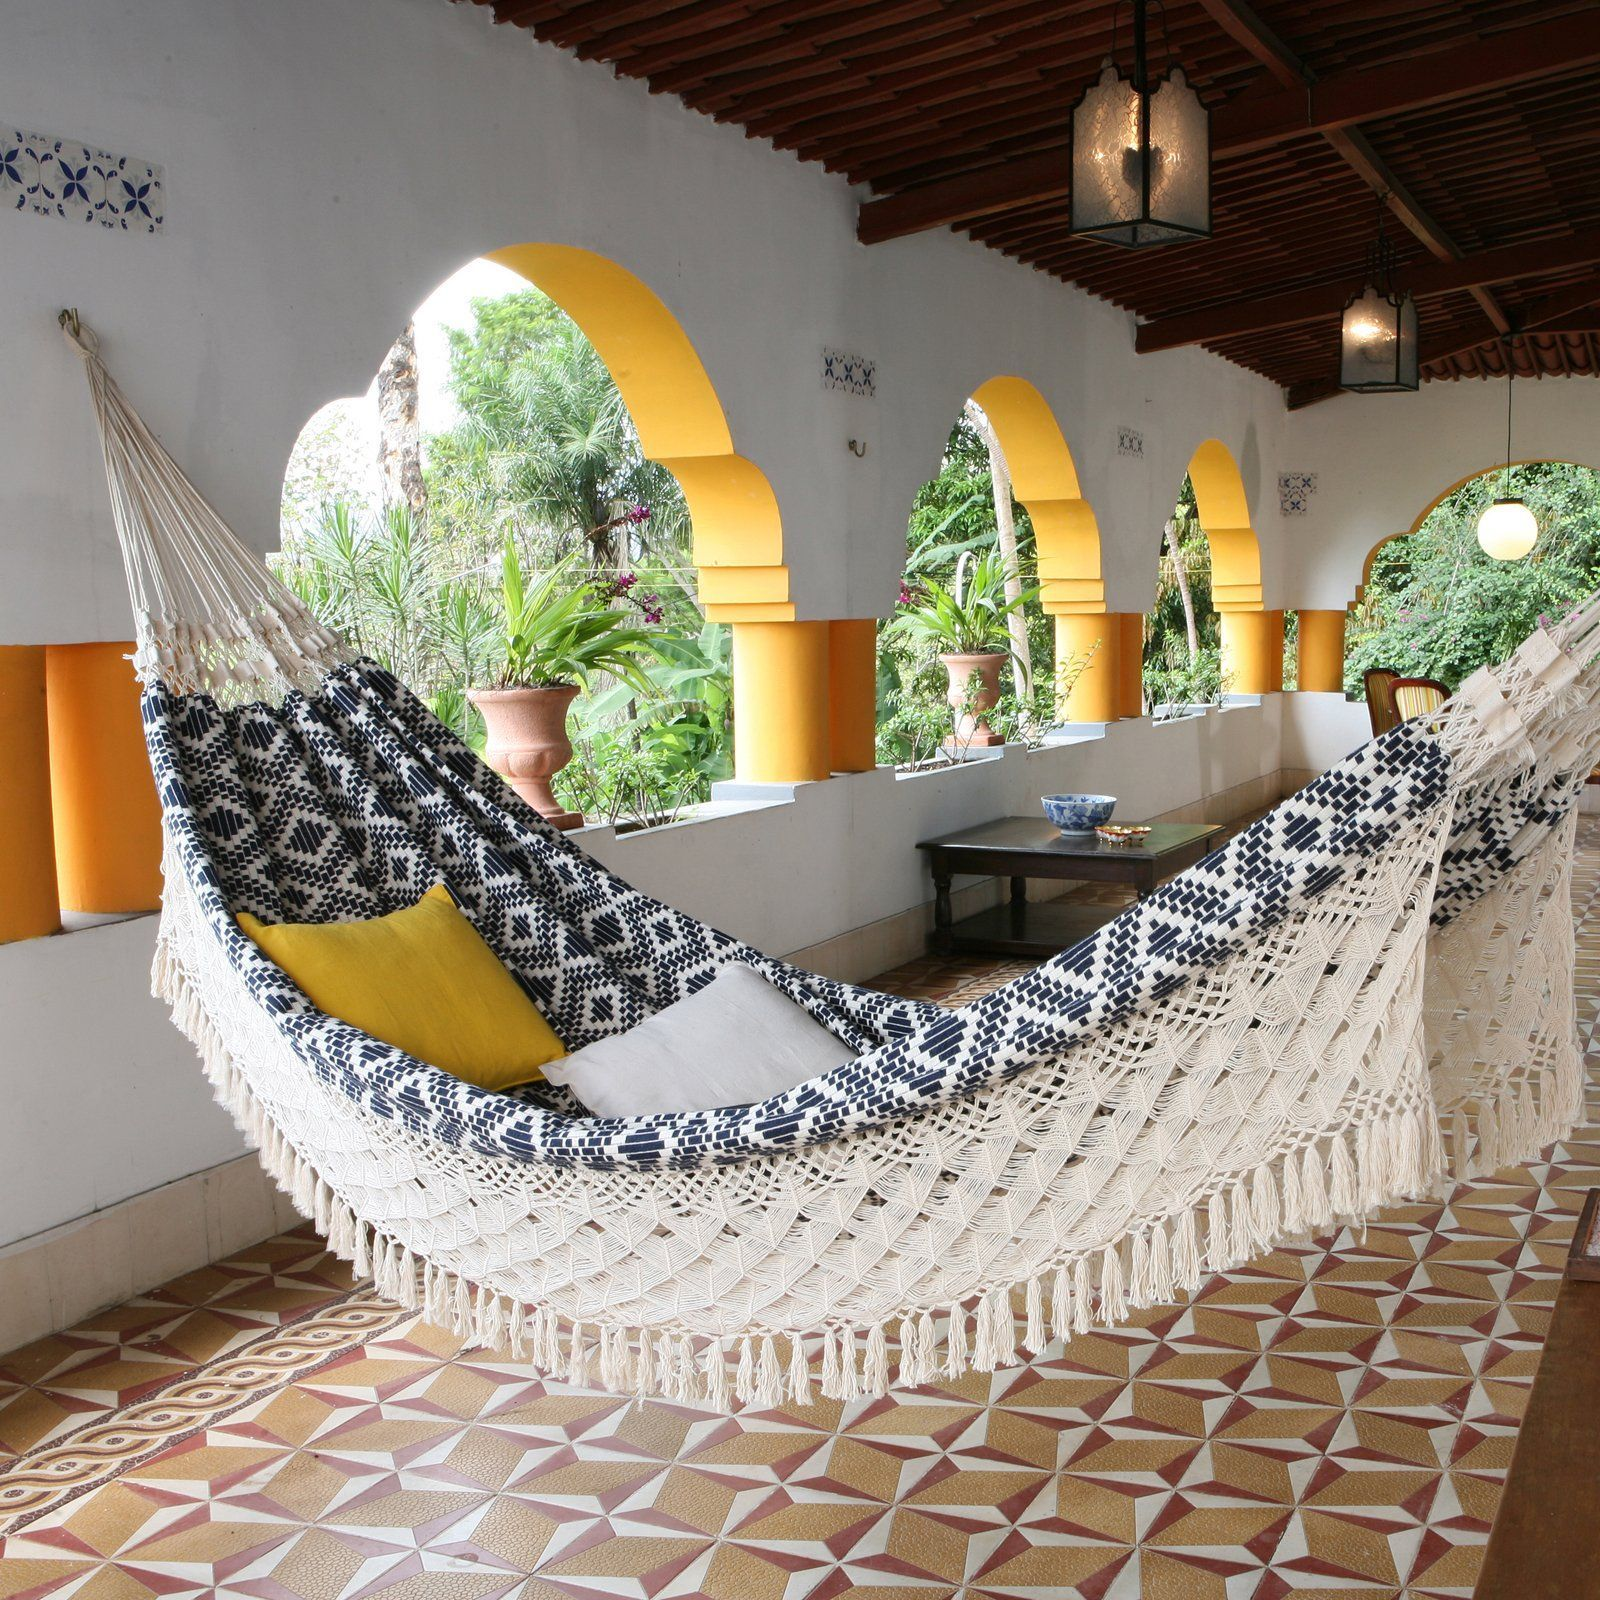 Diy camping hammock ideas pictures balcony hammock garden stand